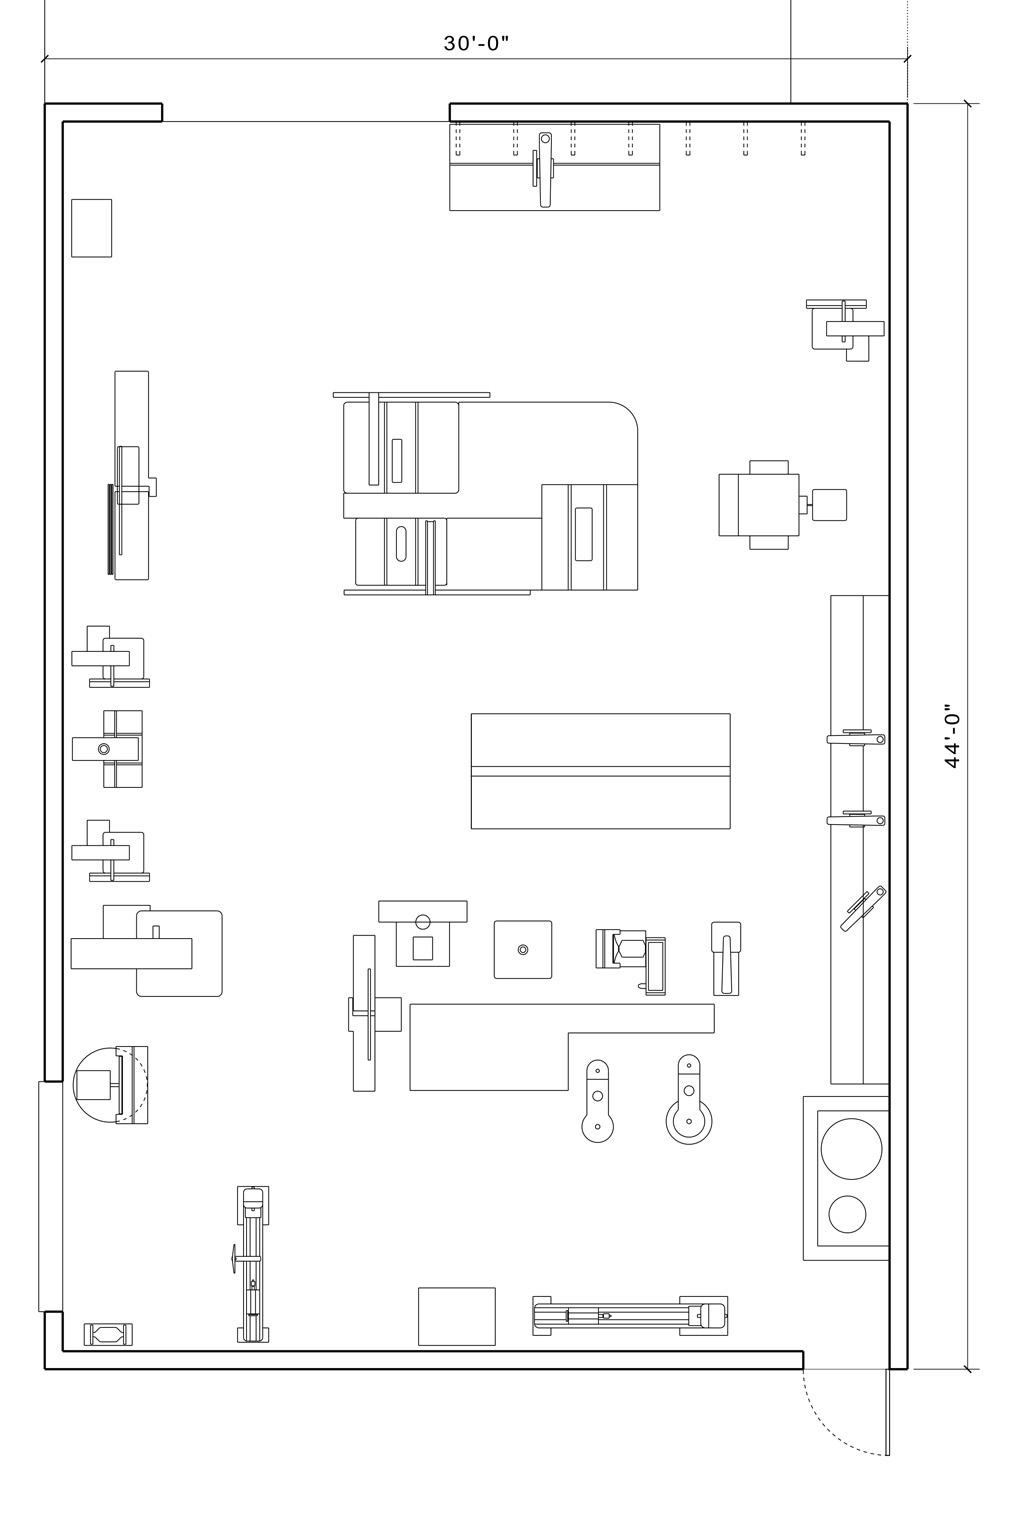 tool_plan2.jpg